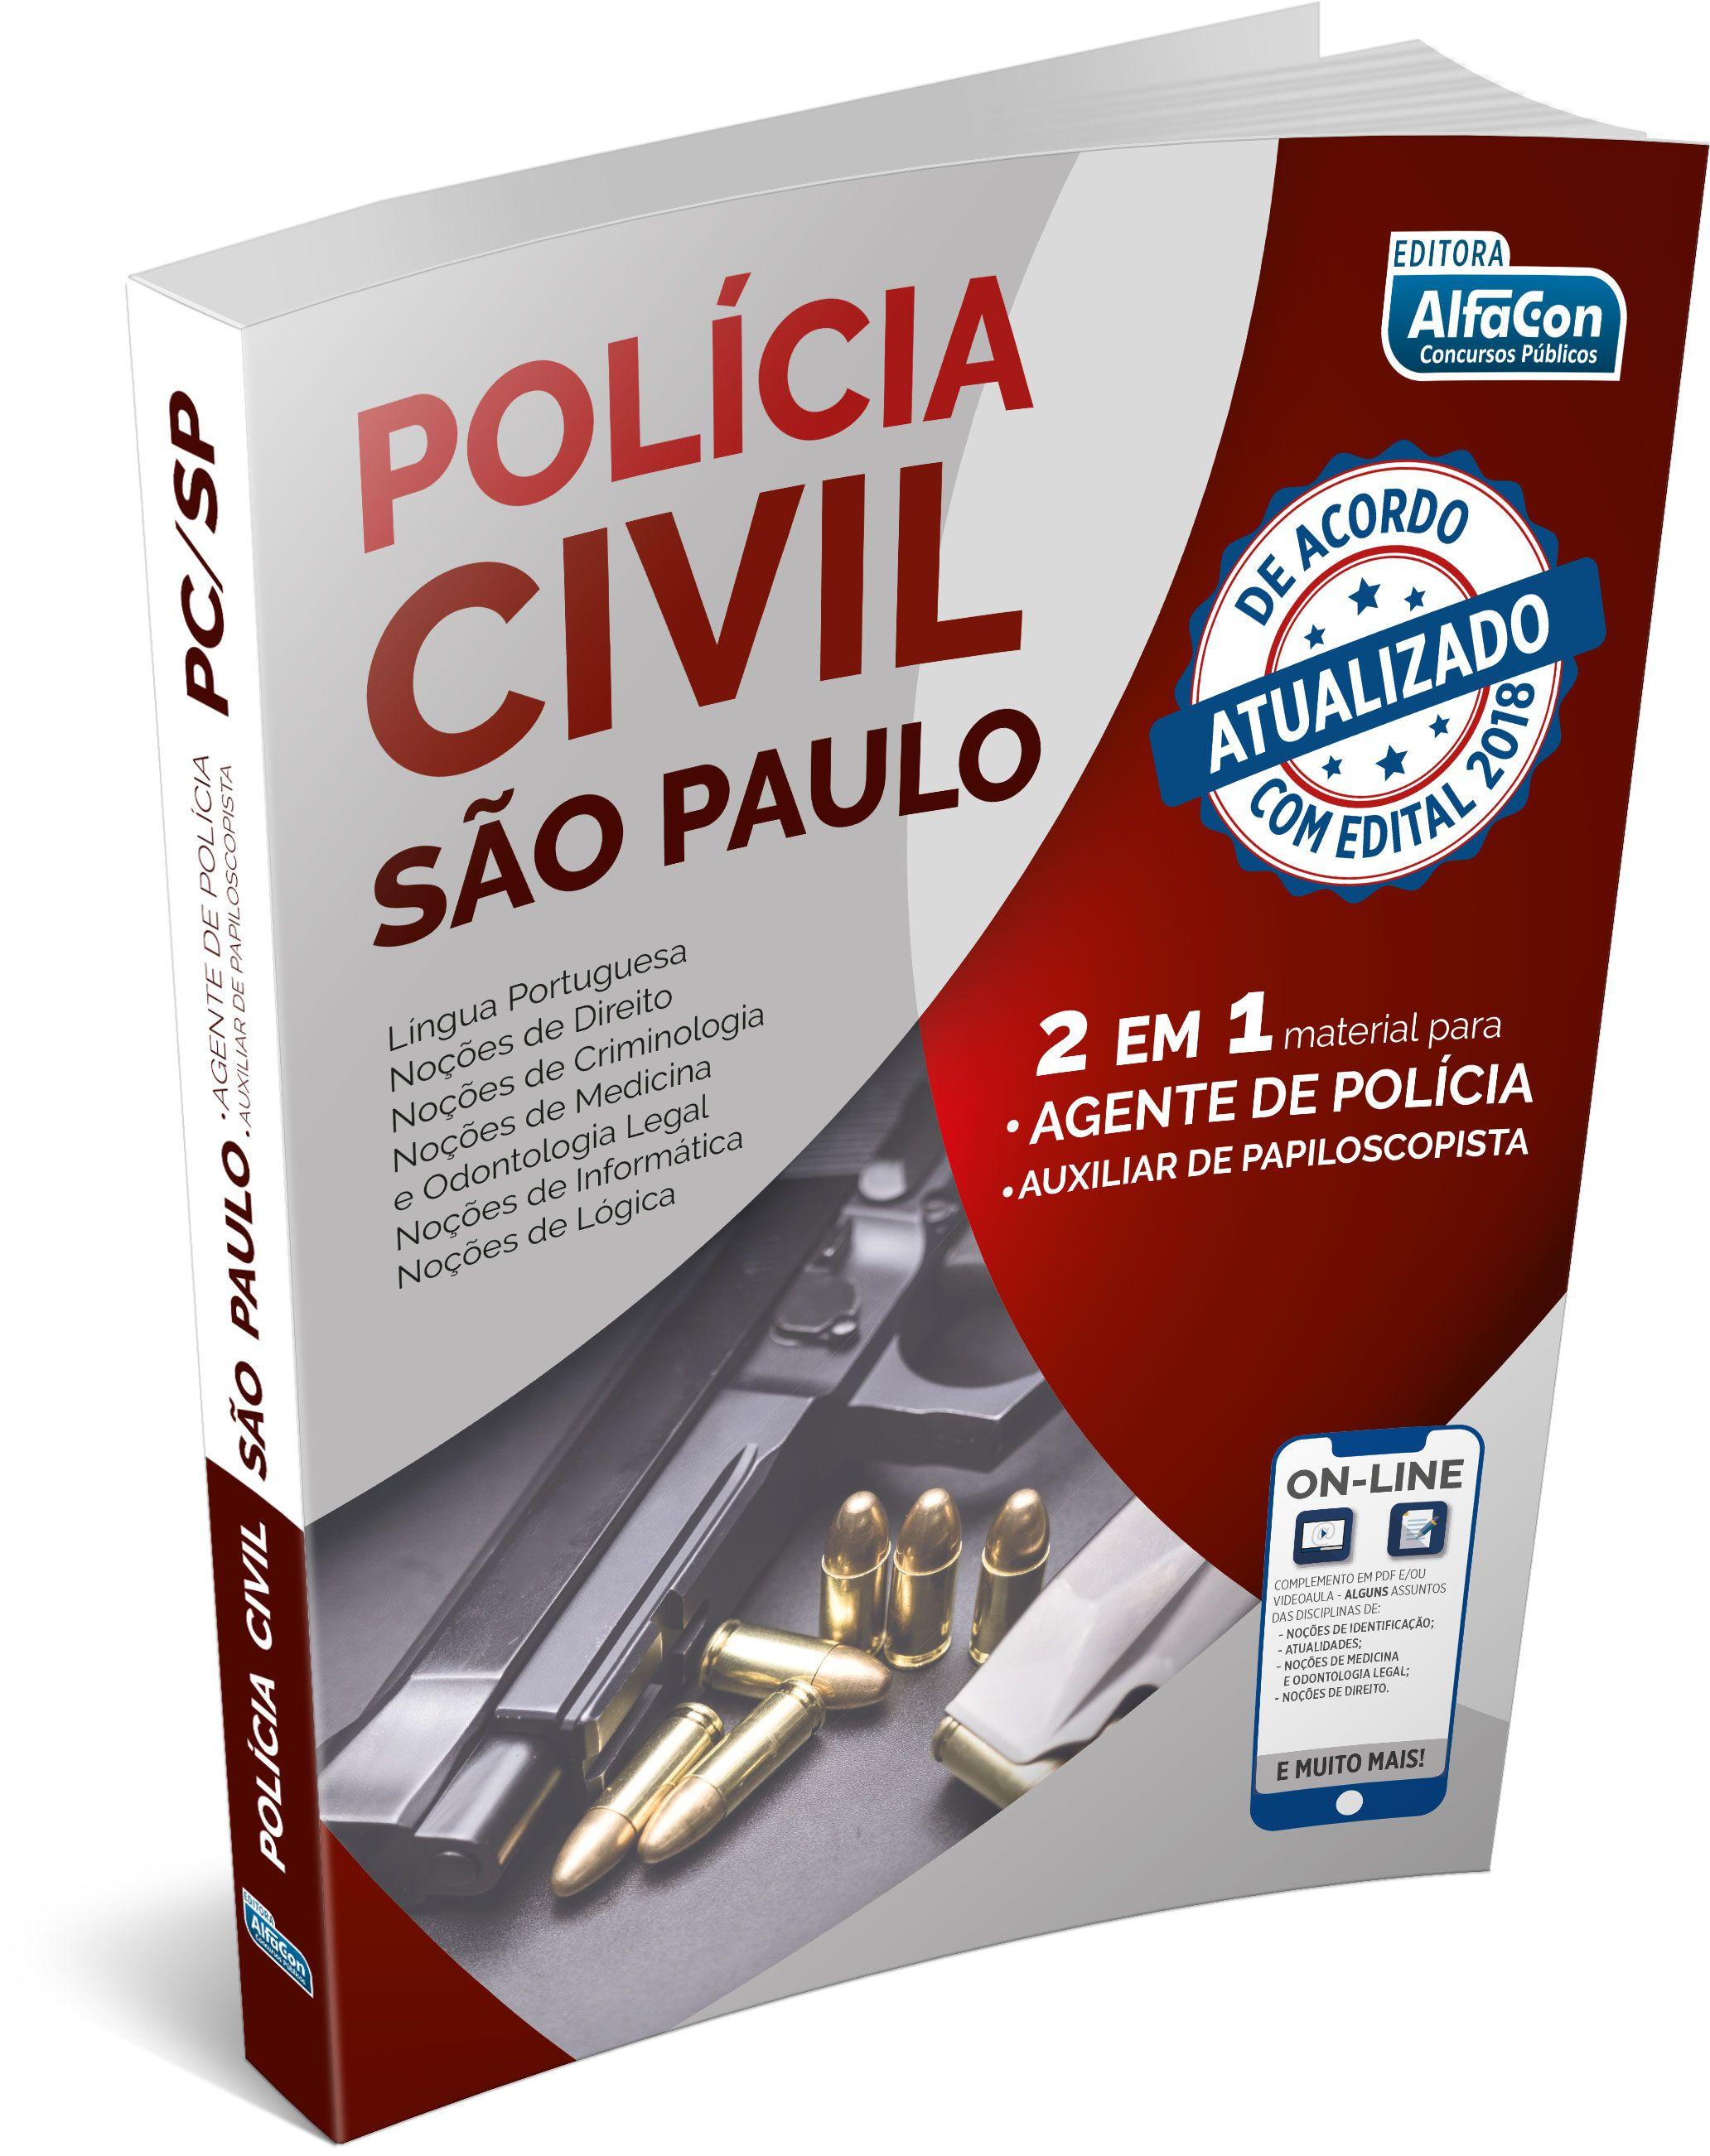 Apostila Policia Civil De Sao Paulo Agente De Policia E Auxiliar